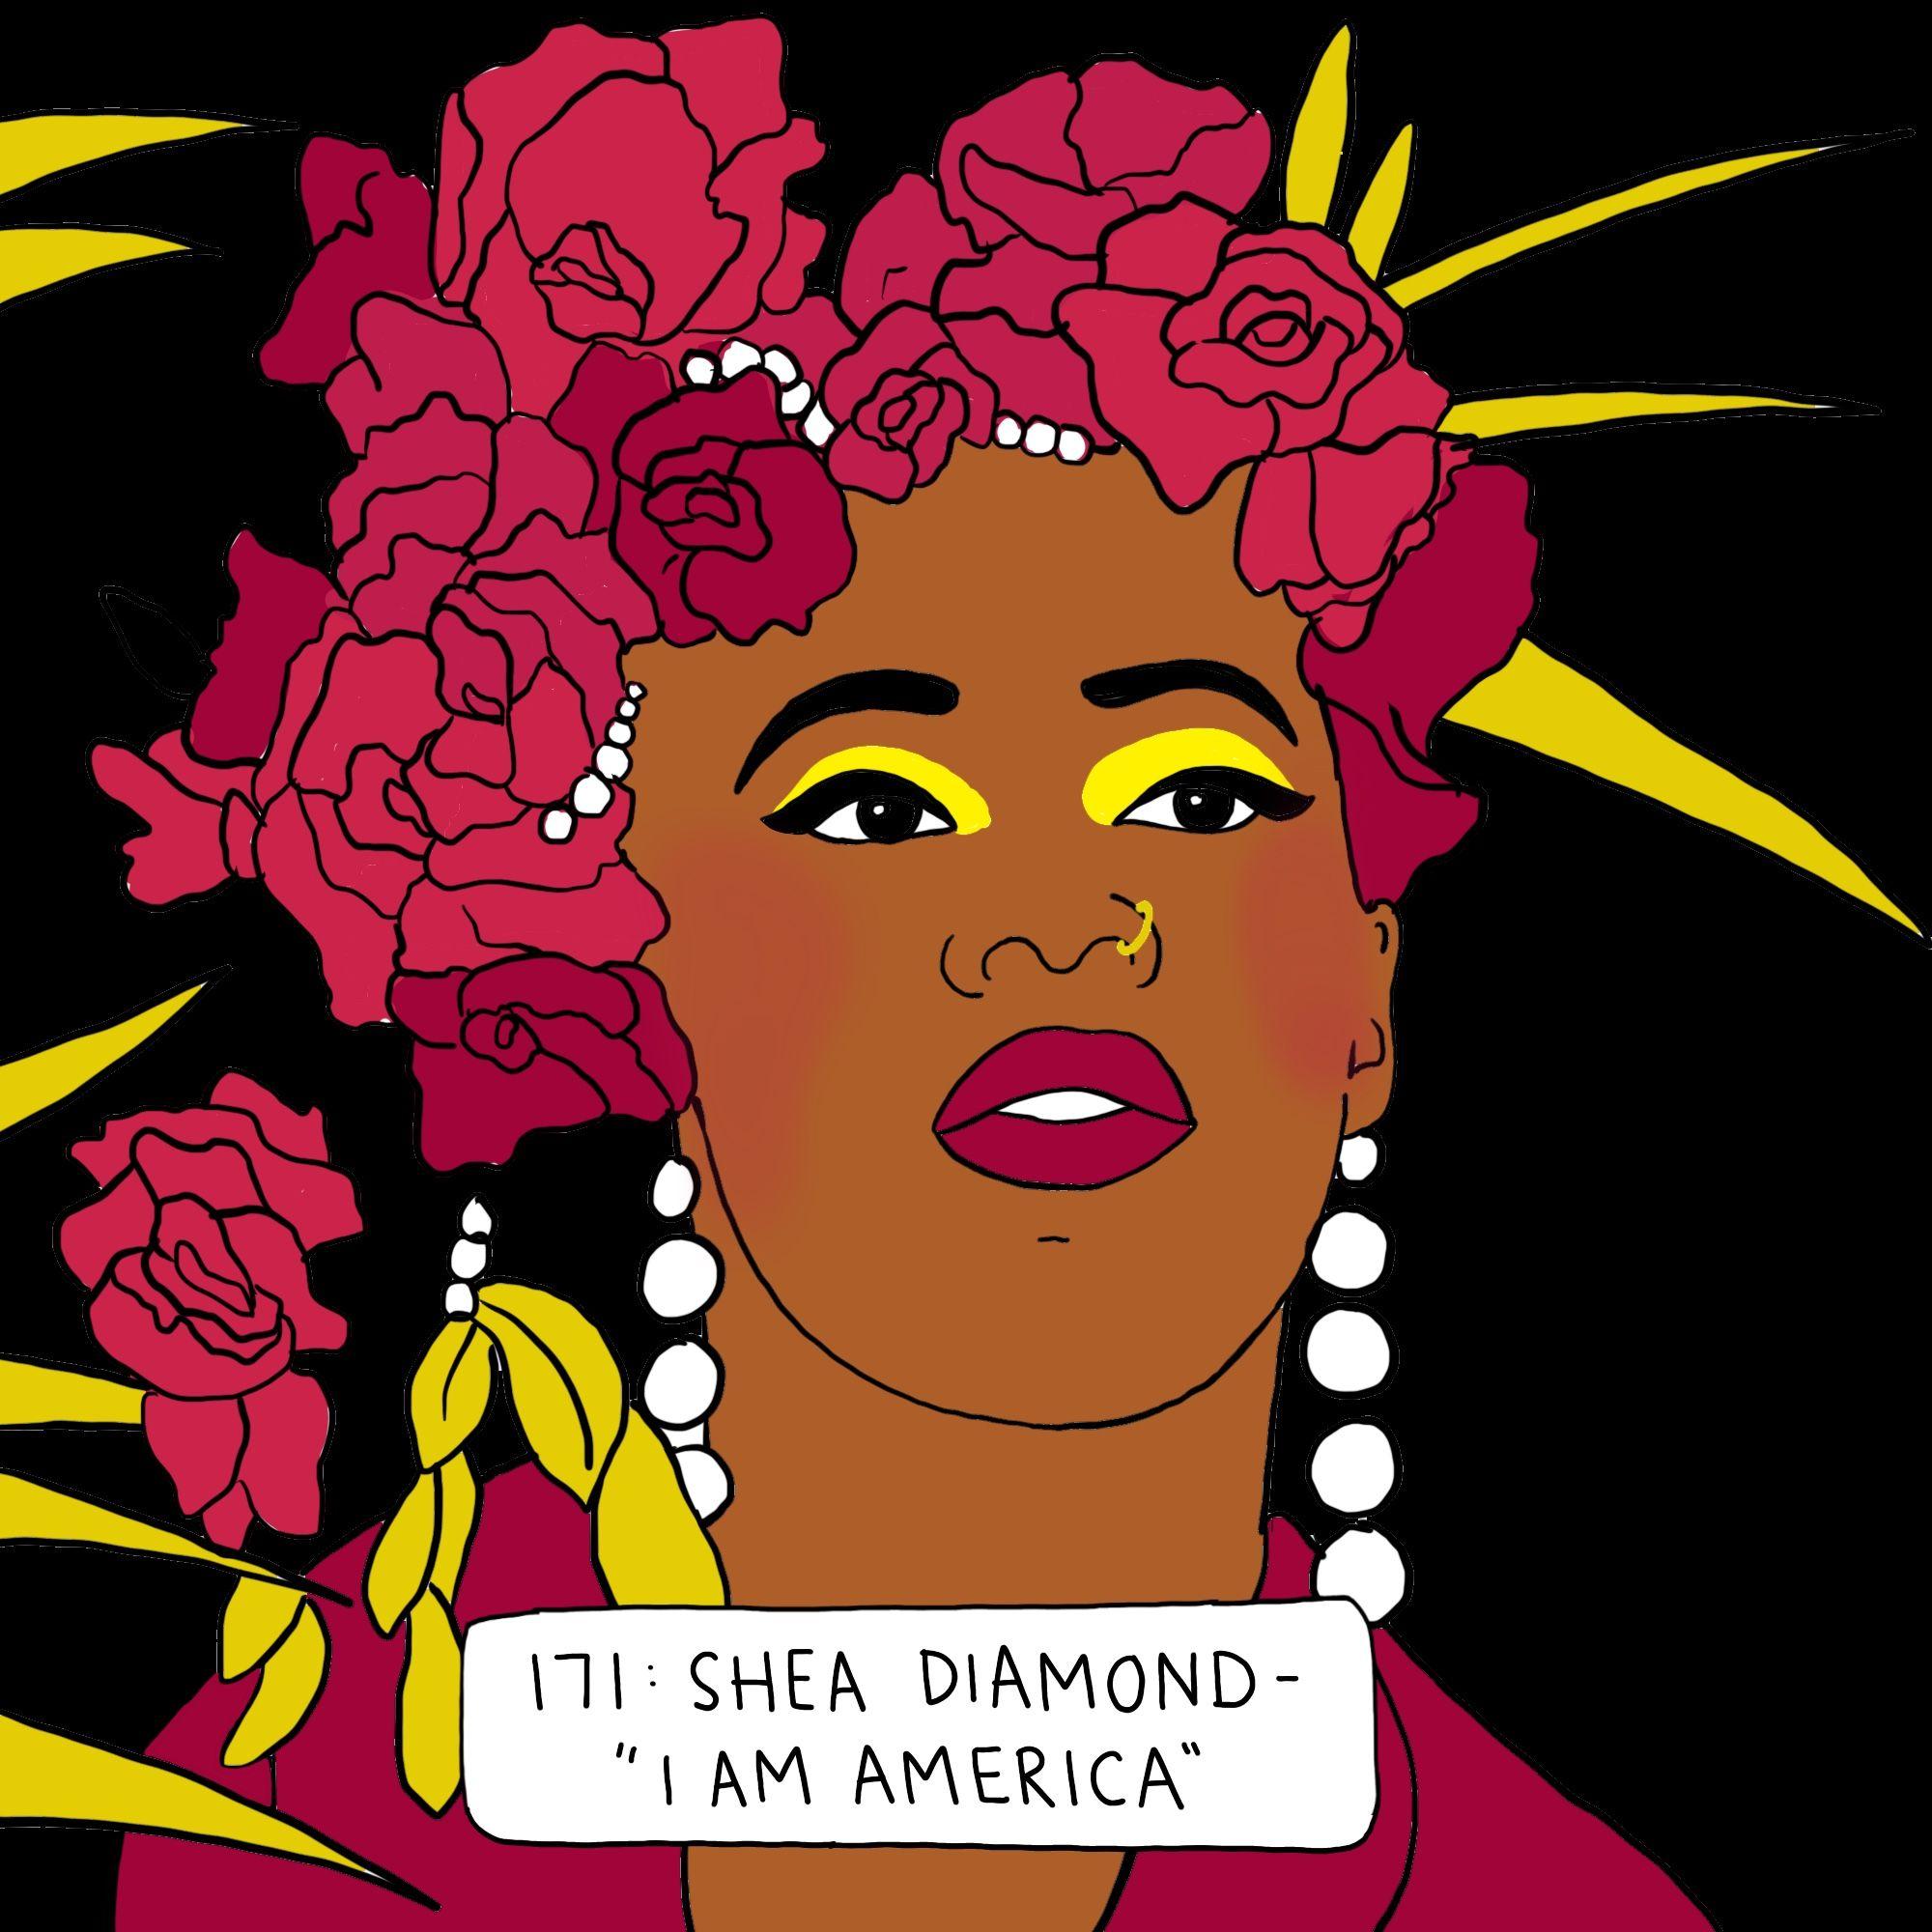 I Am America (w Shea Diamond and Justin Tranter)